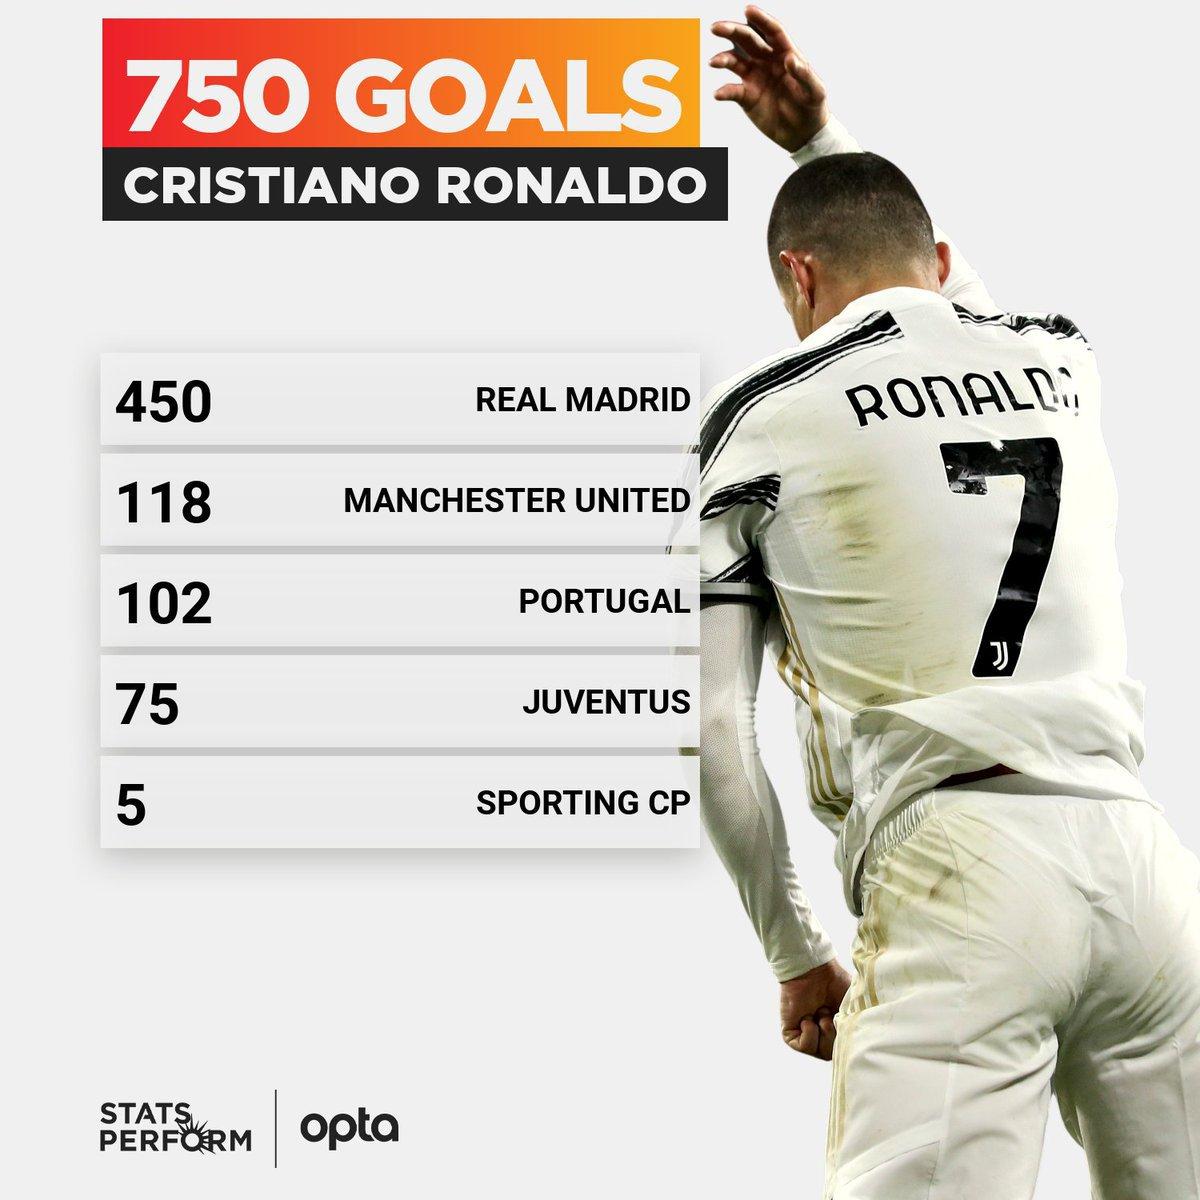 Cristiano Ronaldo 750 goals